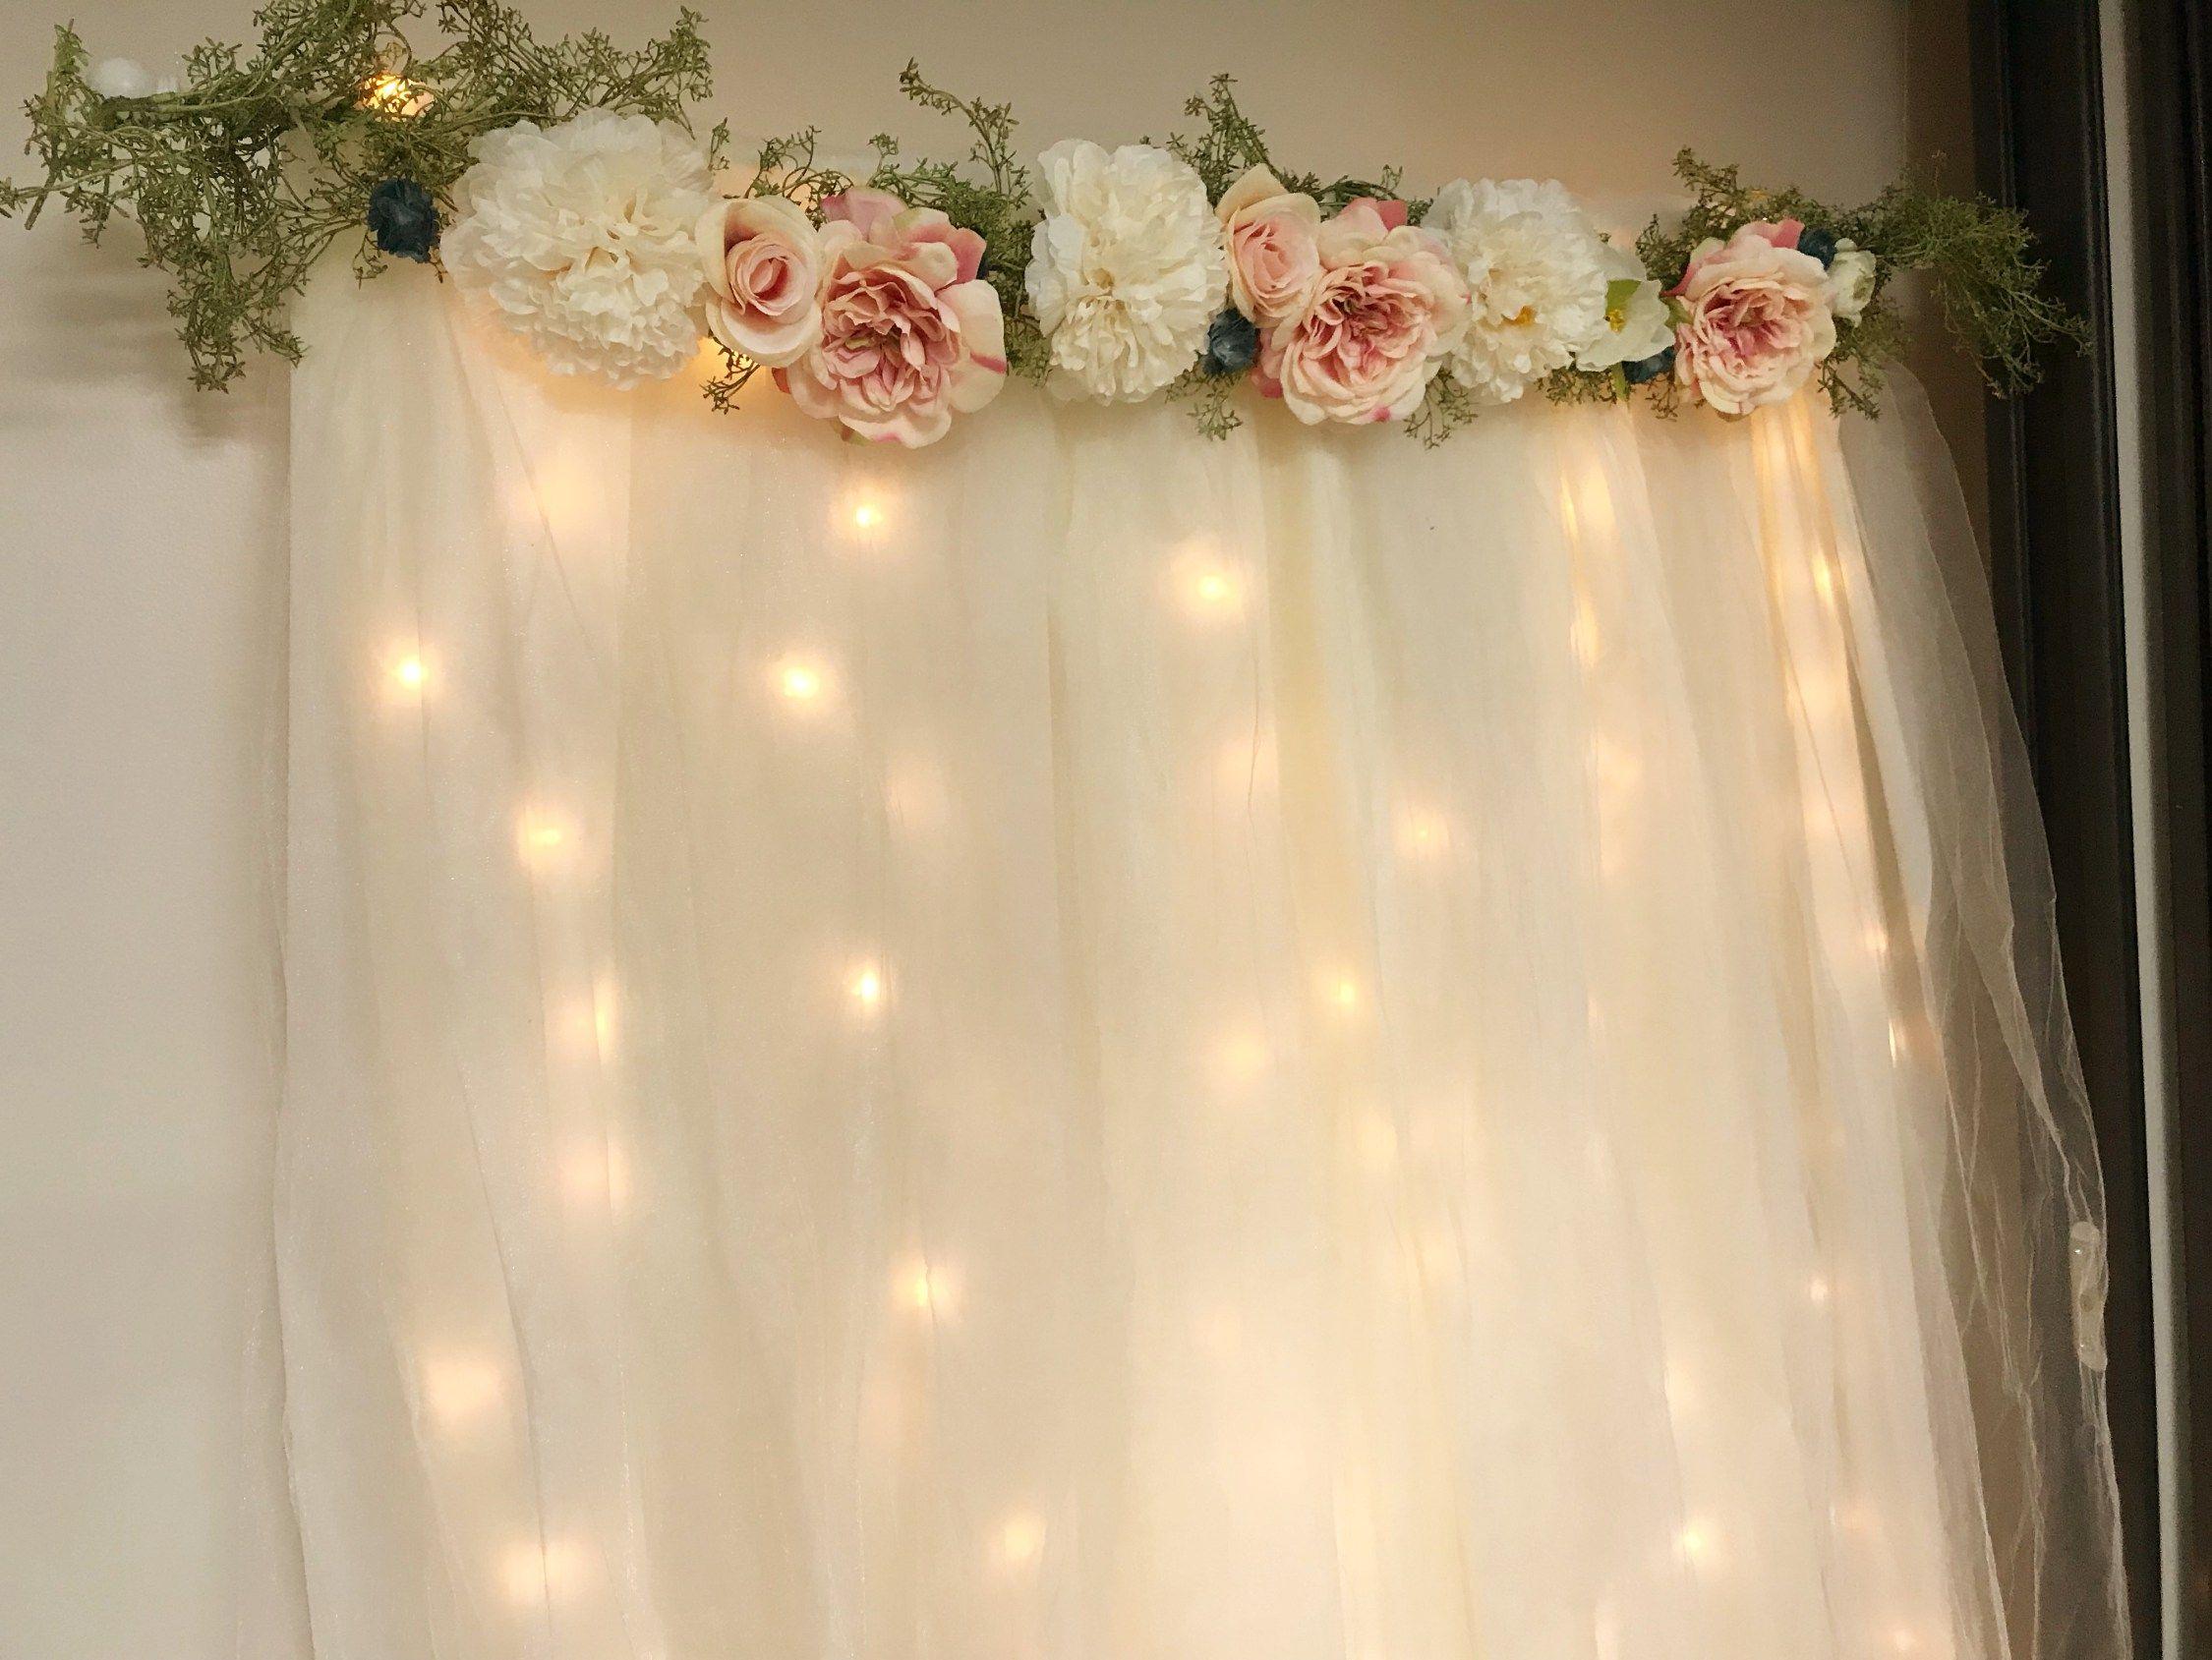 Diy Lit Tulle Backdrop Six Clever Sisters Bridal Shower Backdrop Diy Baby Shower Decorations Budget Baby Shower